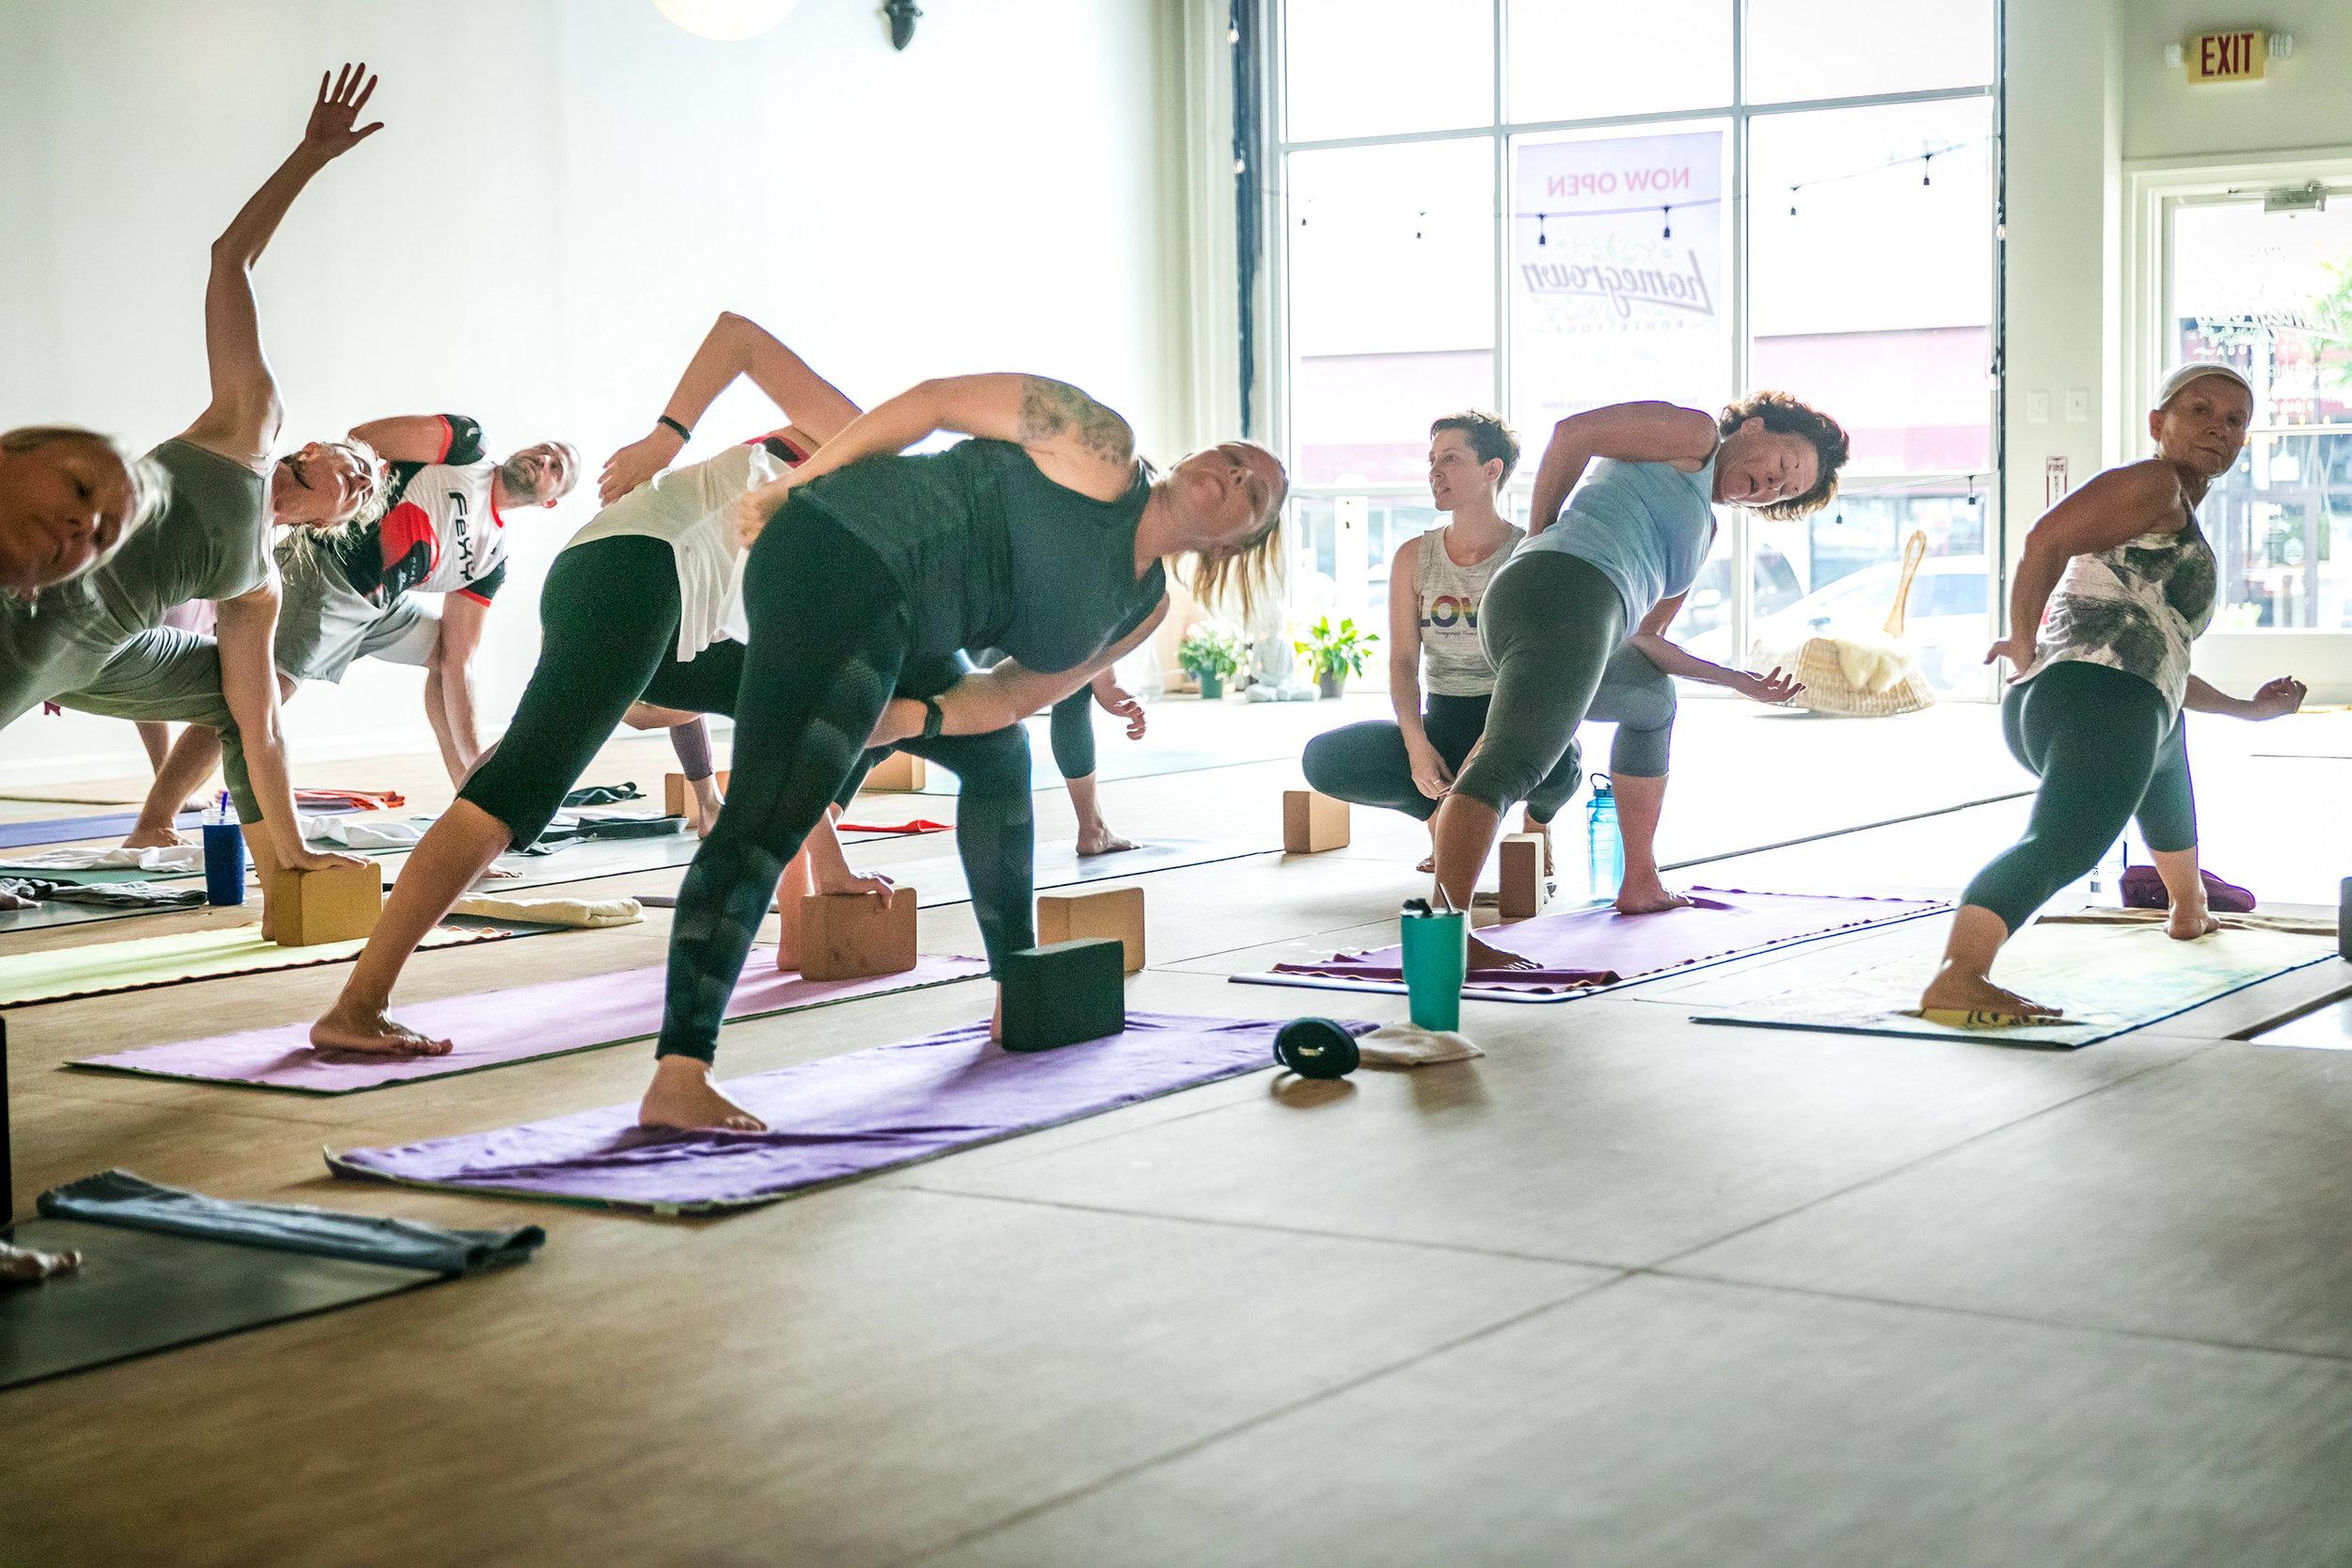 Alison Adams Homegrown Power Yoga teacher and founder teaching a class